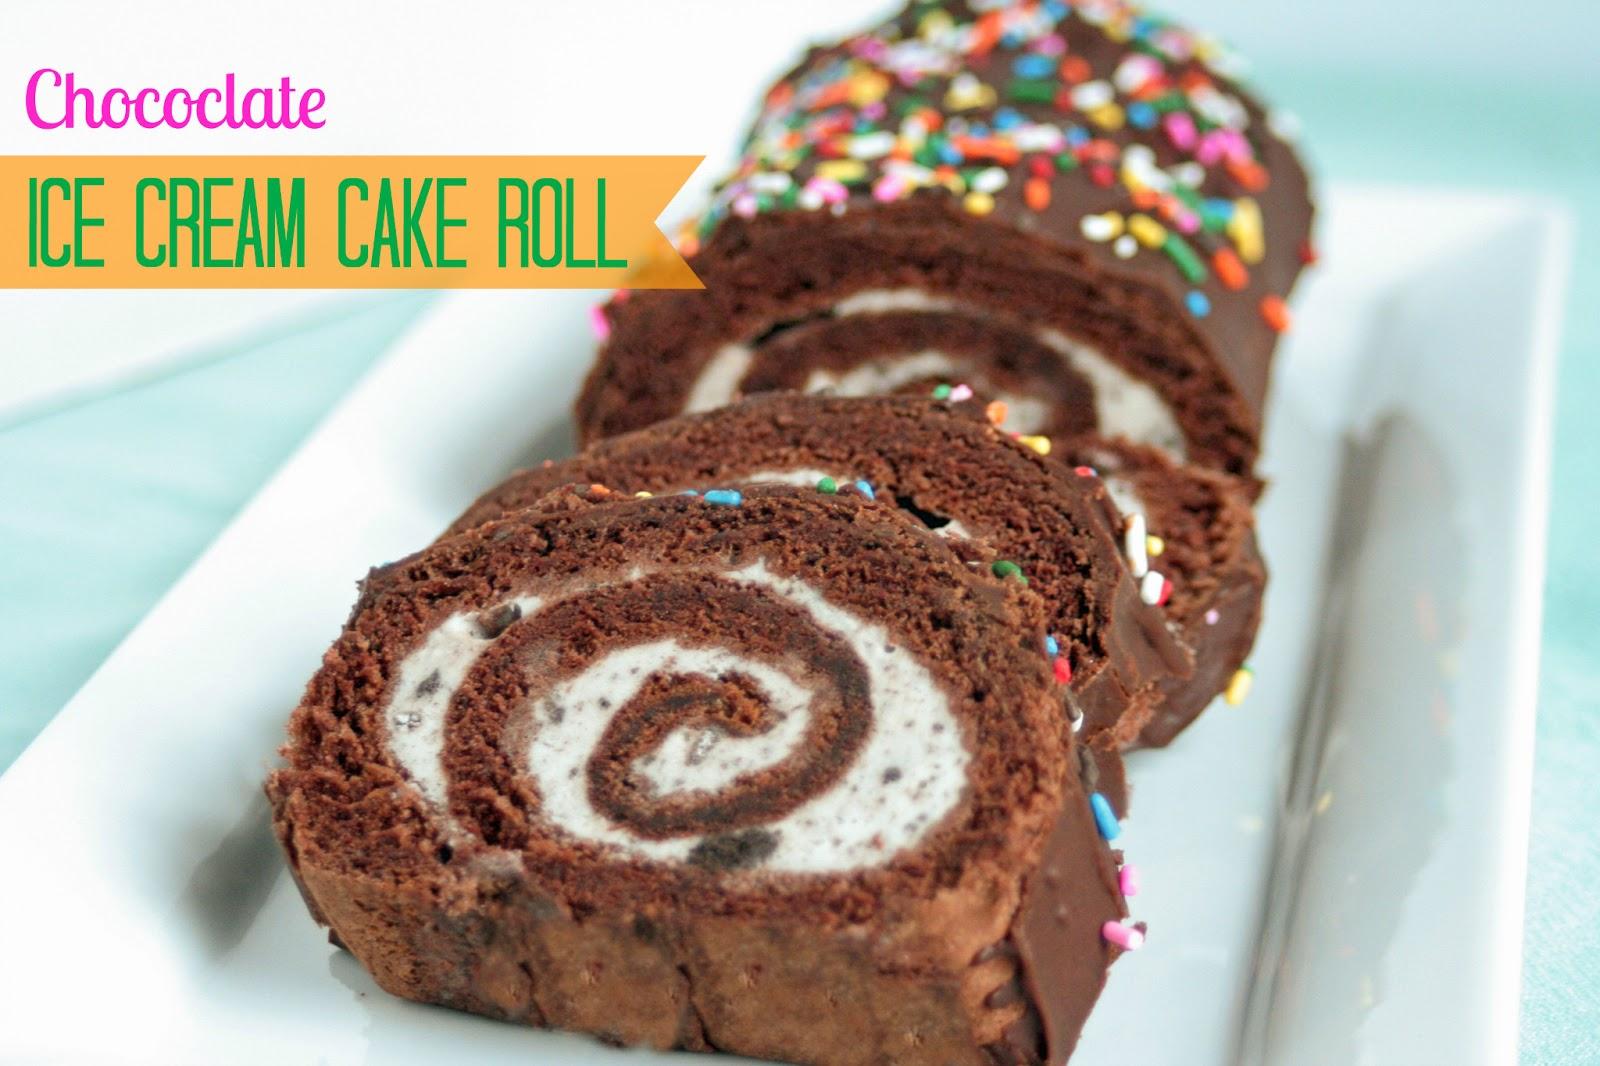 Vanilla Ice Cream Cake Roll